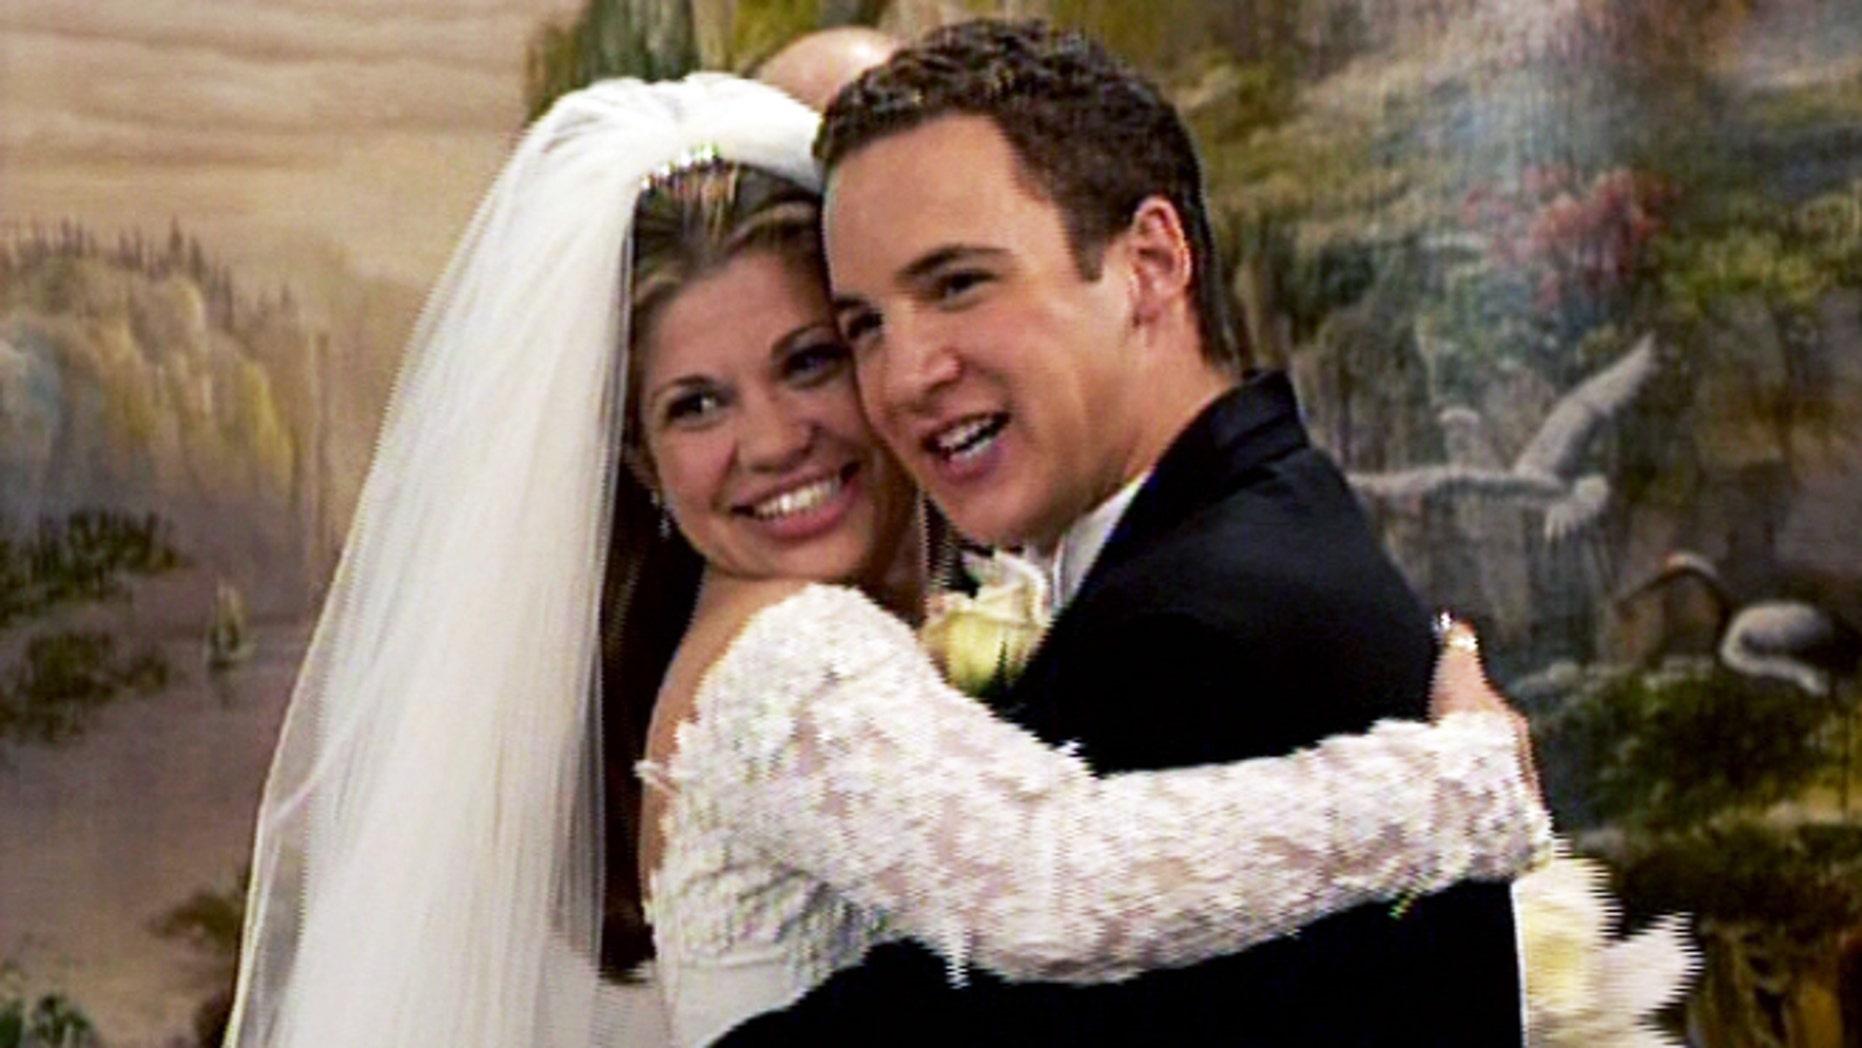 Danielle Fishel Wedding.Boy Meets World Reboot Girl Meets World To Star Danielle Fishel